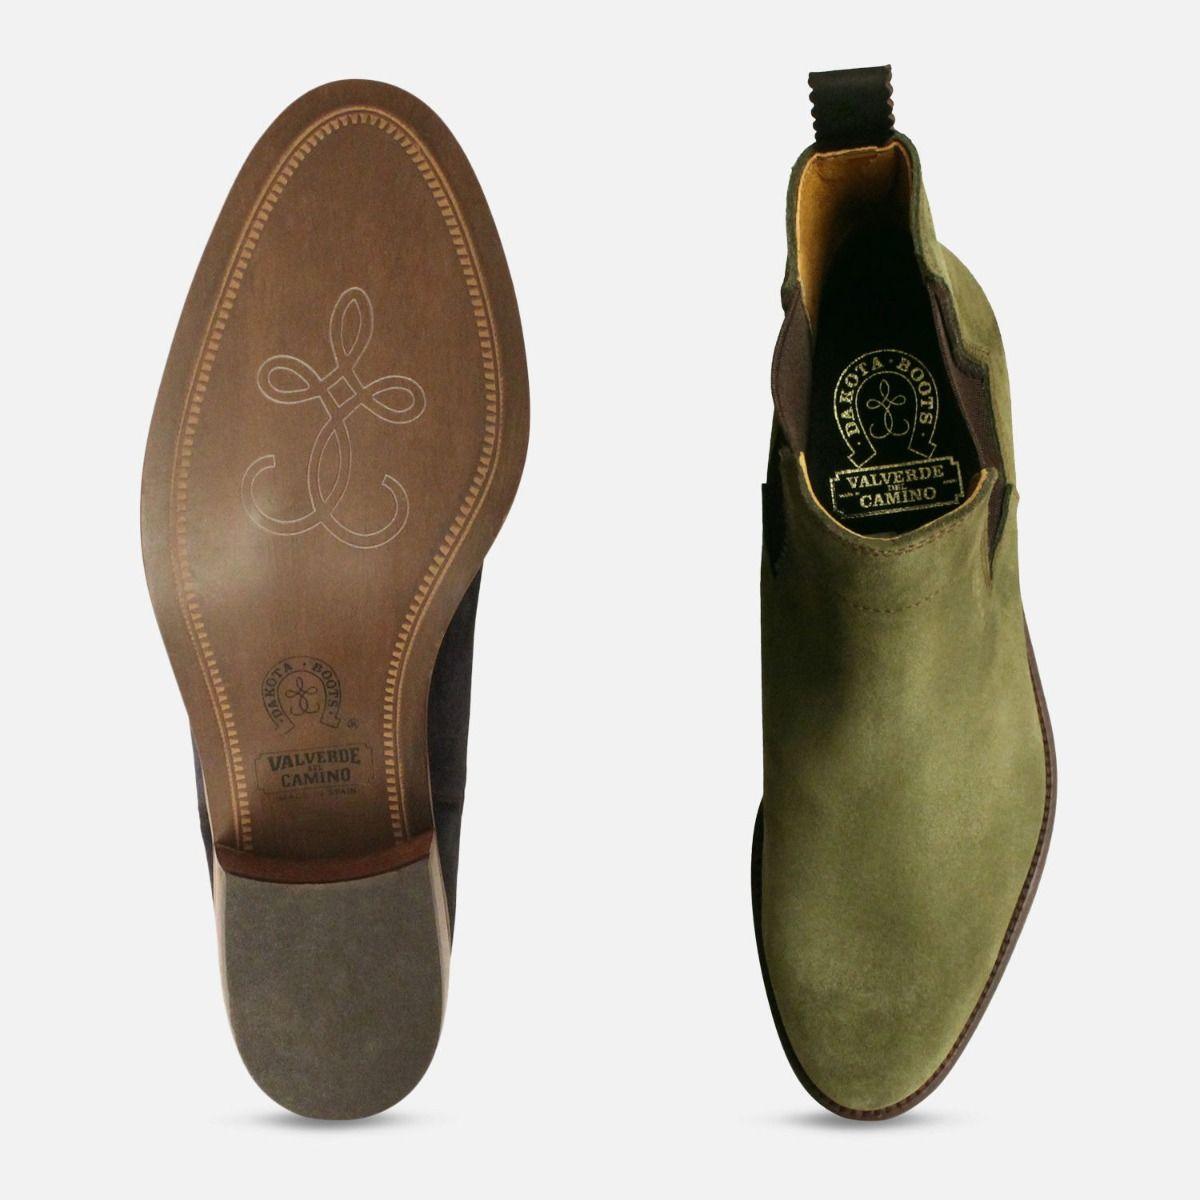 Cuban Heel Chelsea Boots in Moss Green Suede 650792dda3ba